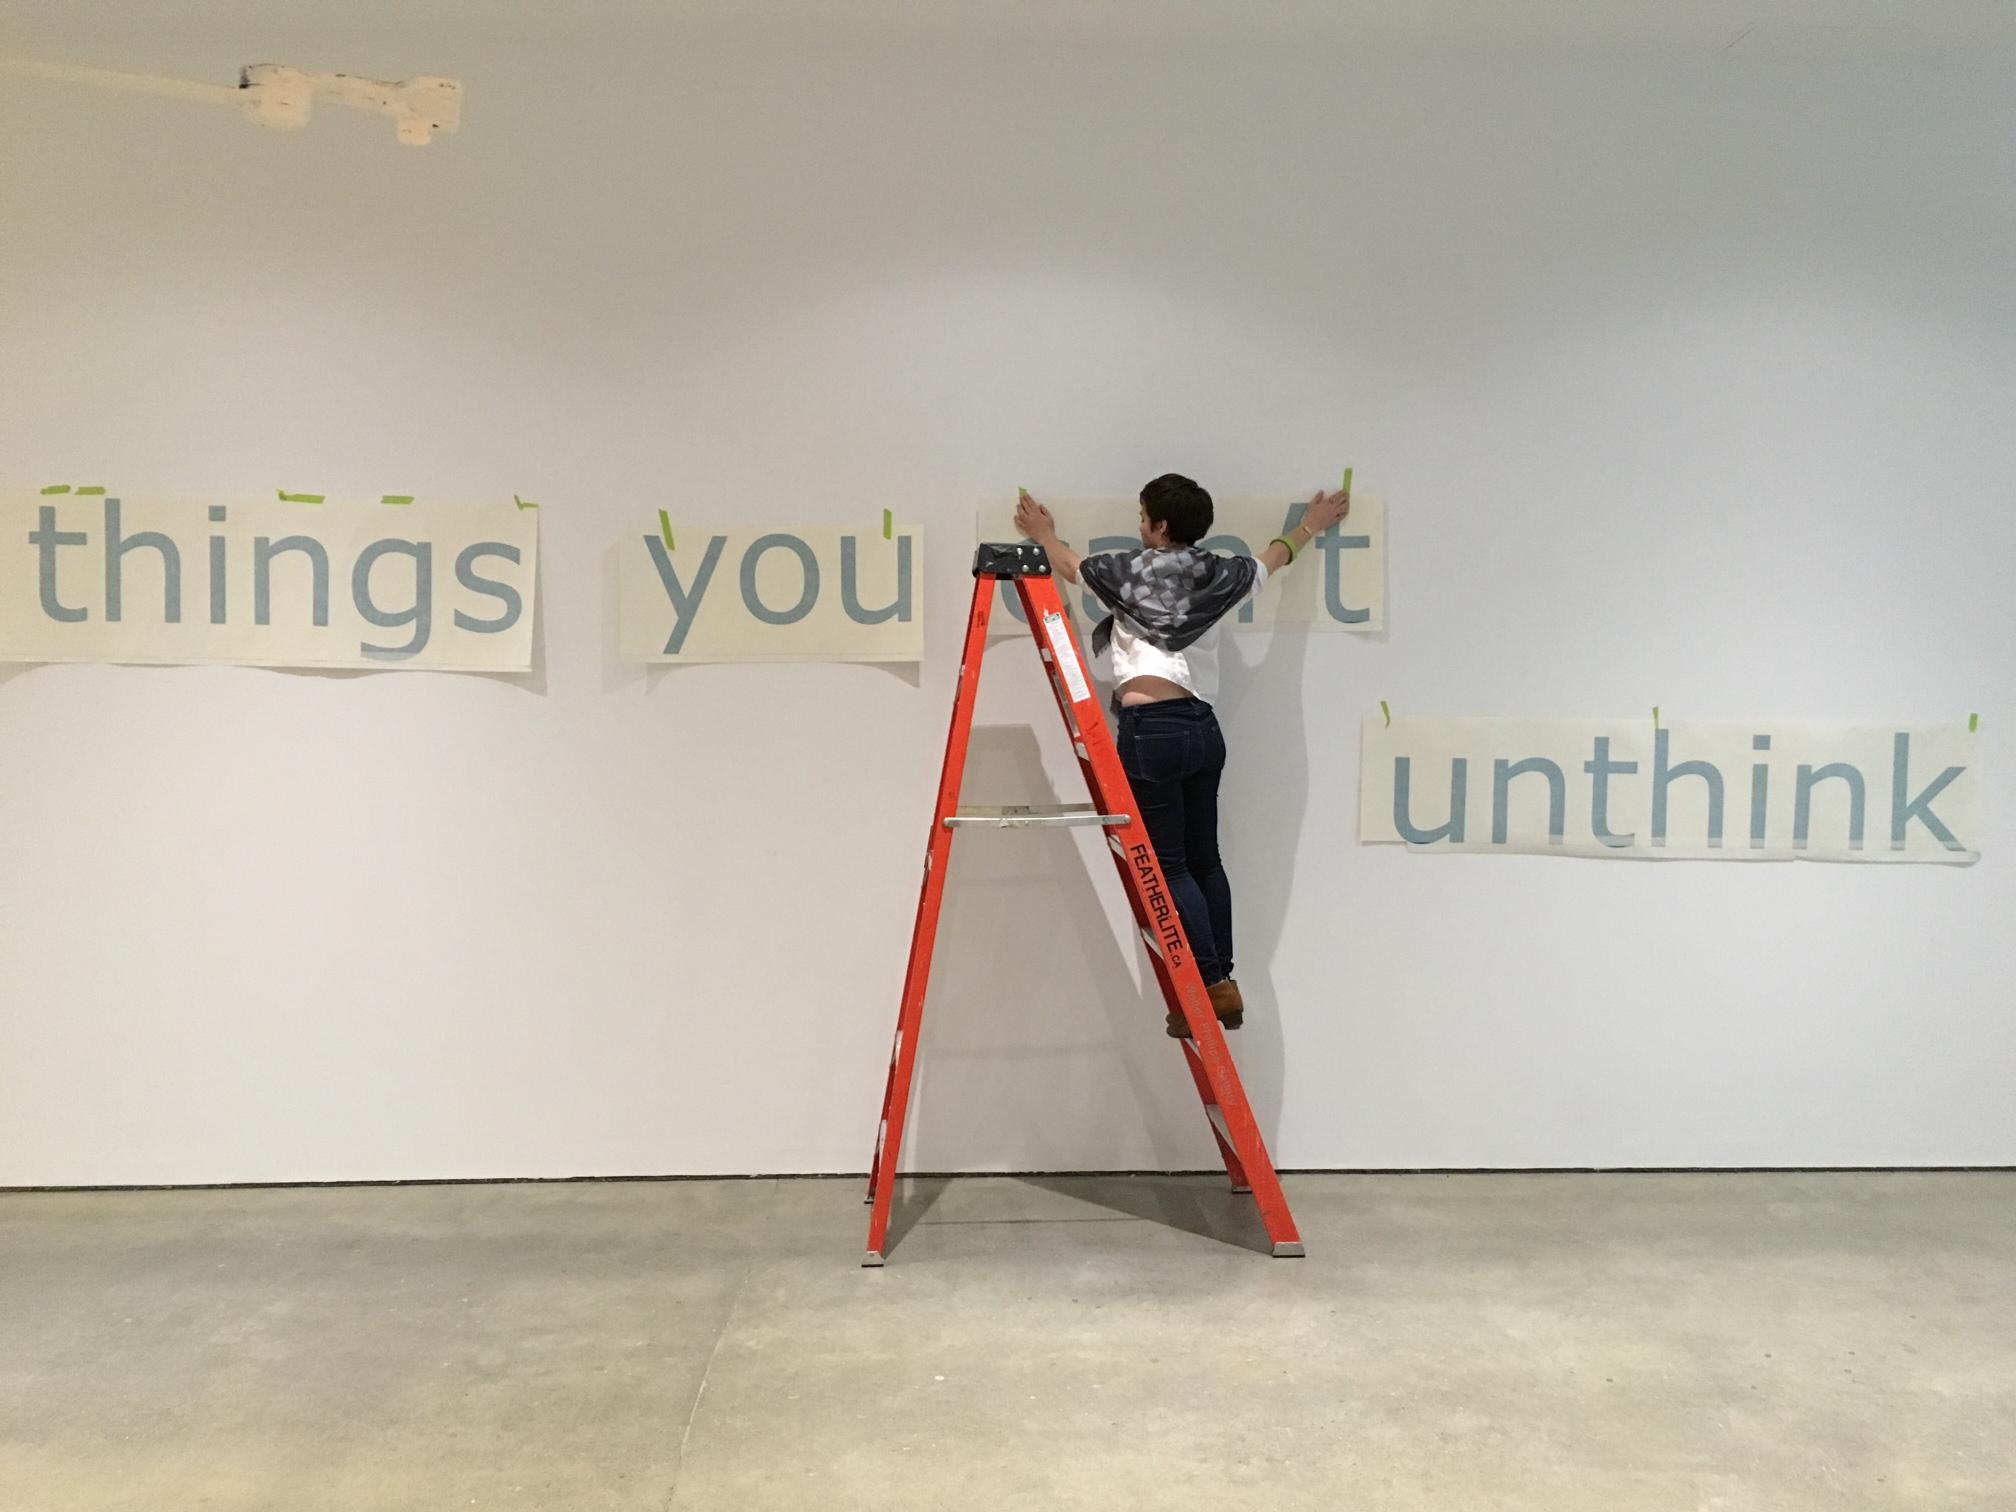 Exhibition installation activity.